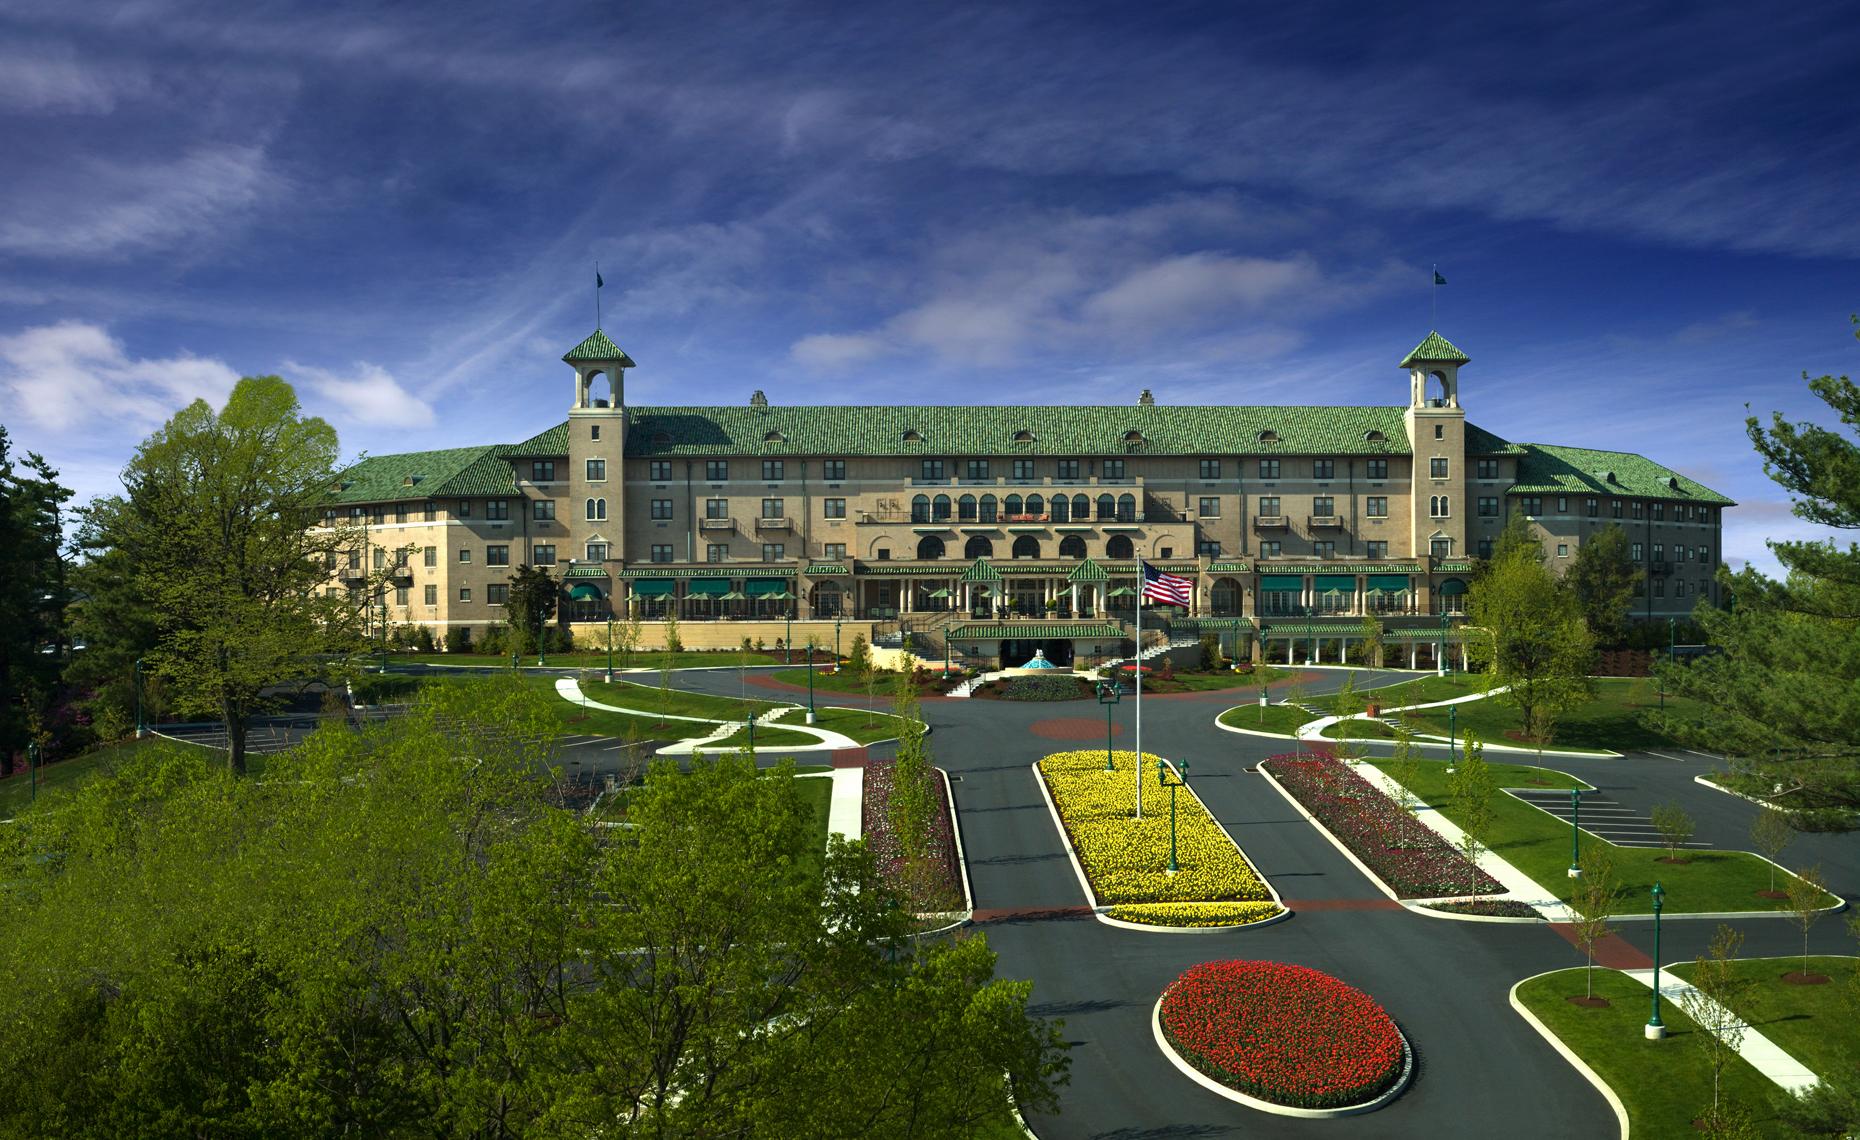 Hershey+Hotel_Panorama4+rgb+final+small+copy.jpg